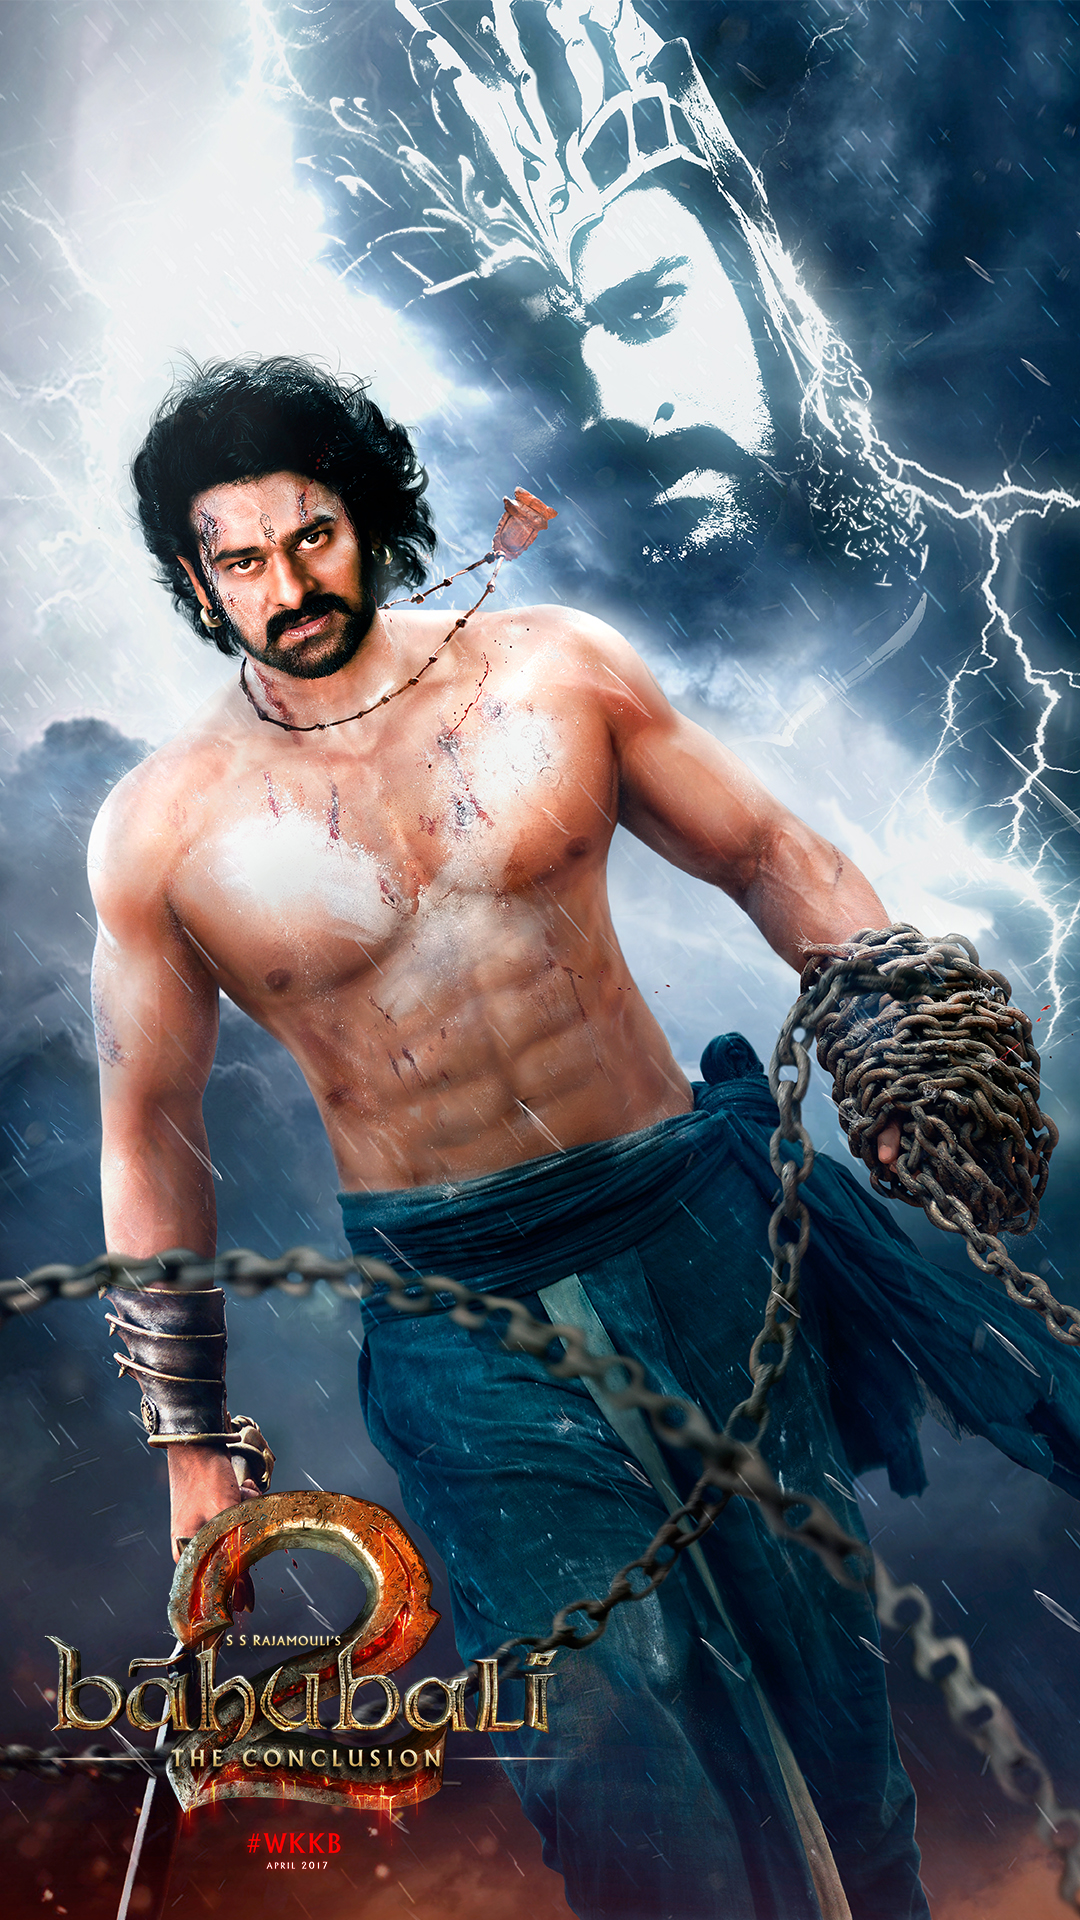 Bahubali 2 Movie Posters - HD Wallpaper